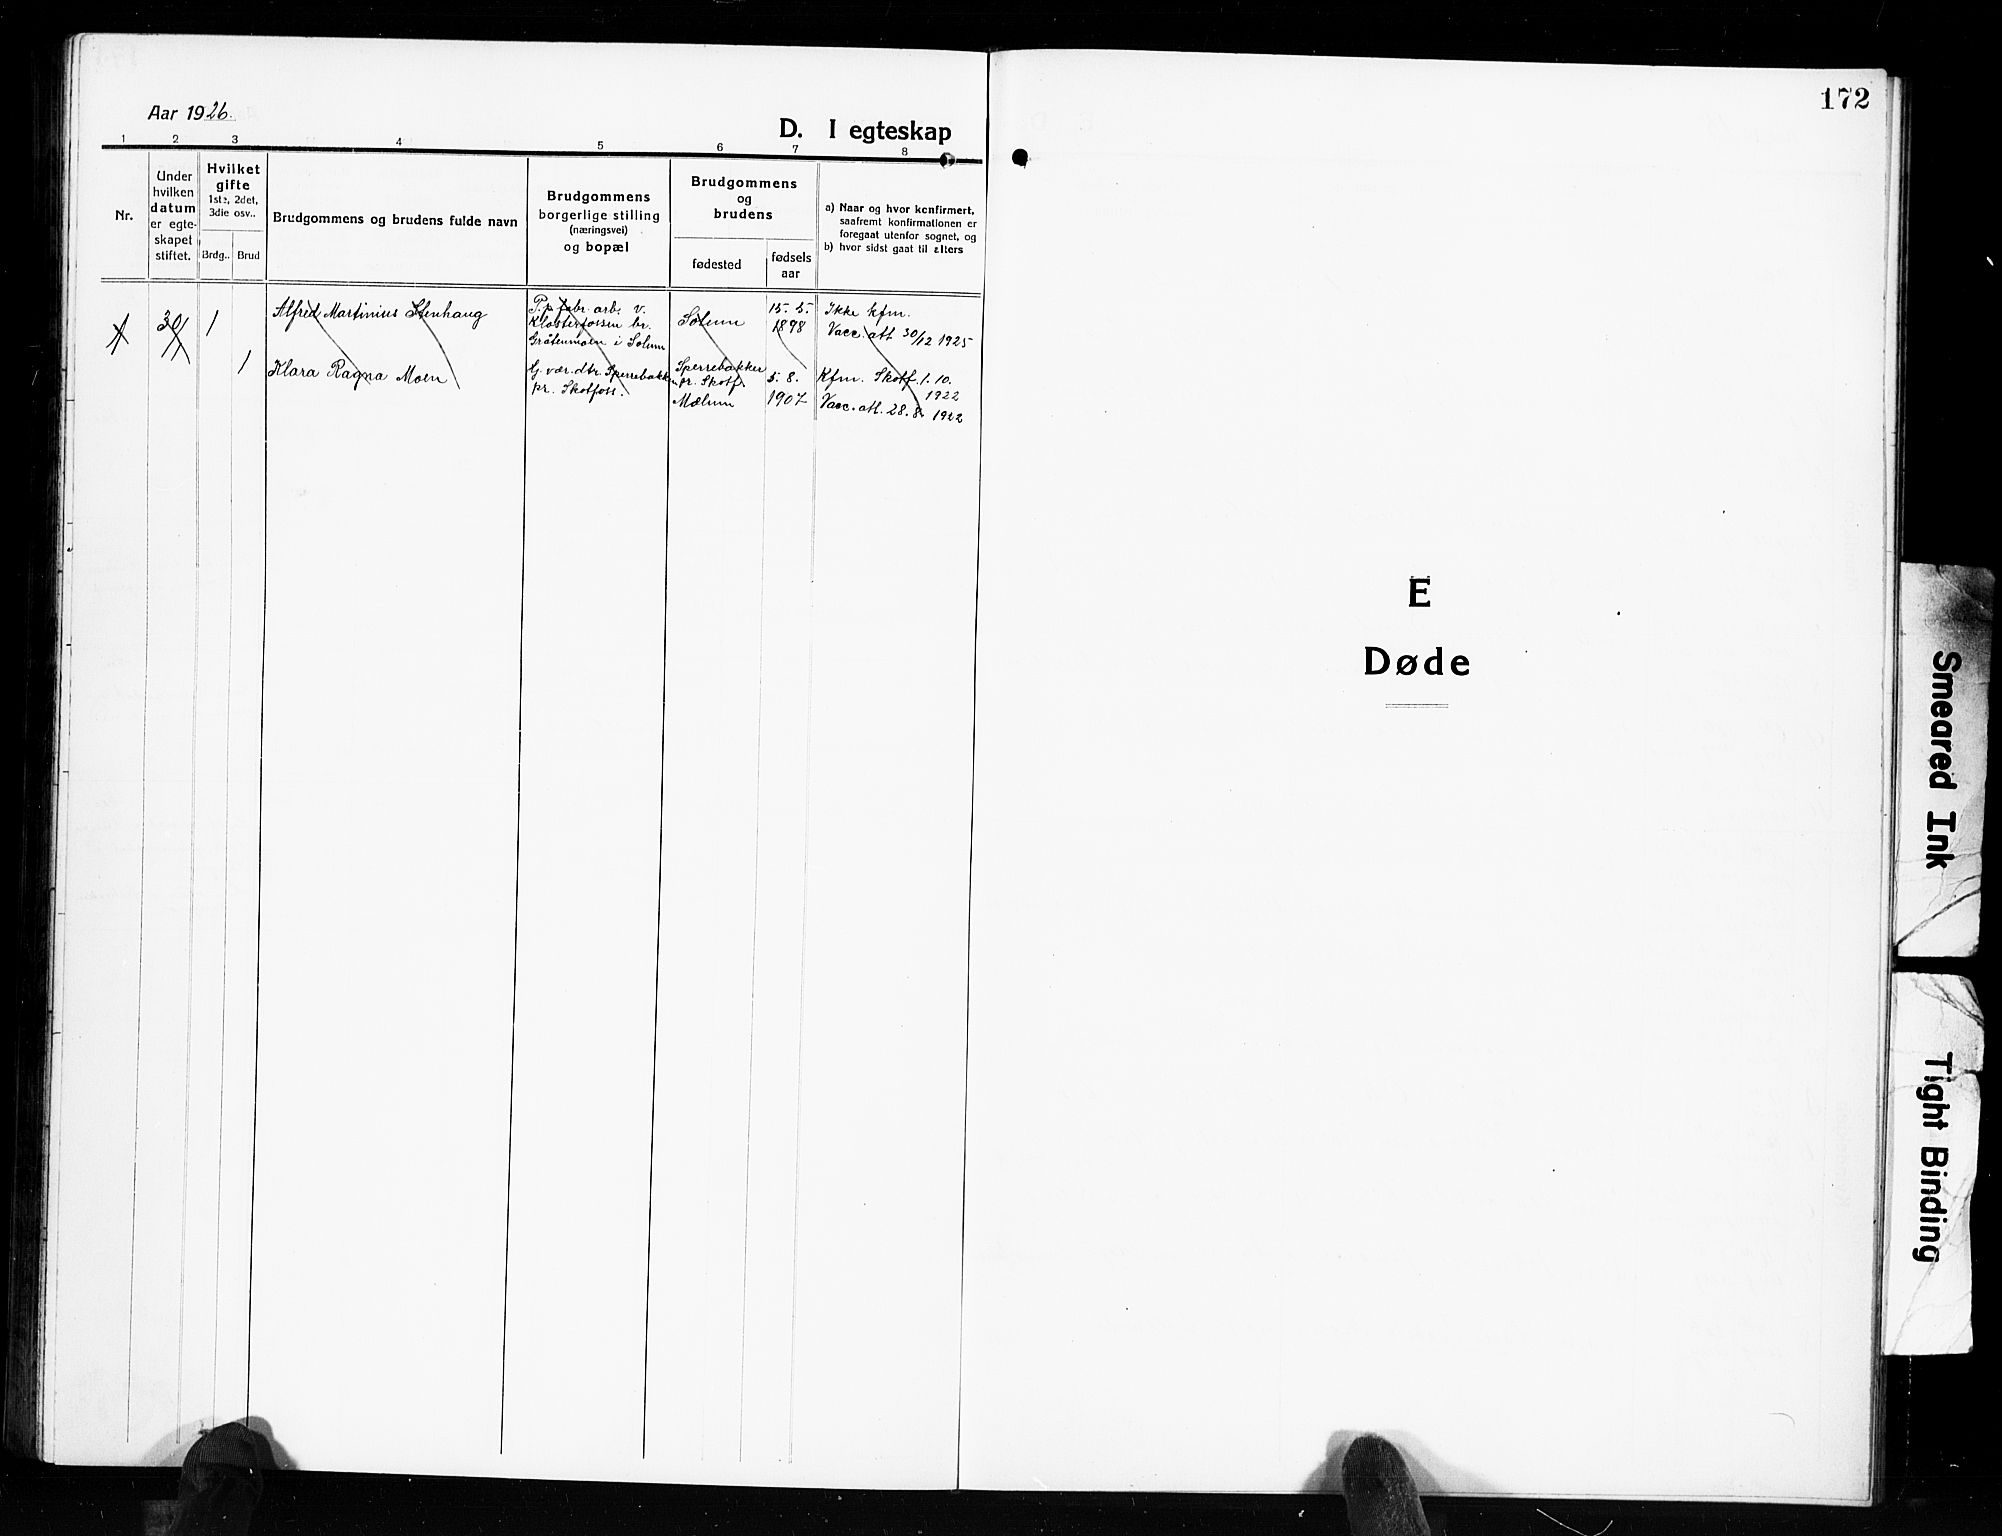 SAKO, Solum kirkebøker, G/Gb/L0006: Klokkerbok nr. II 6, 1915-1927, s. 172